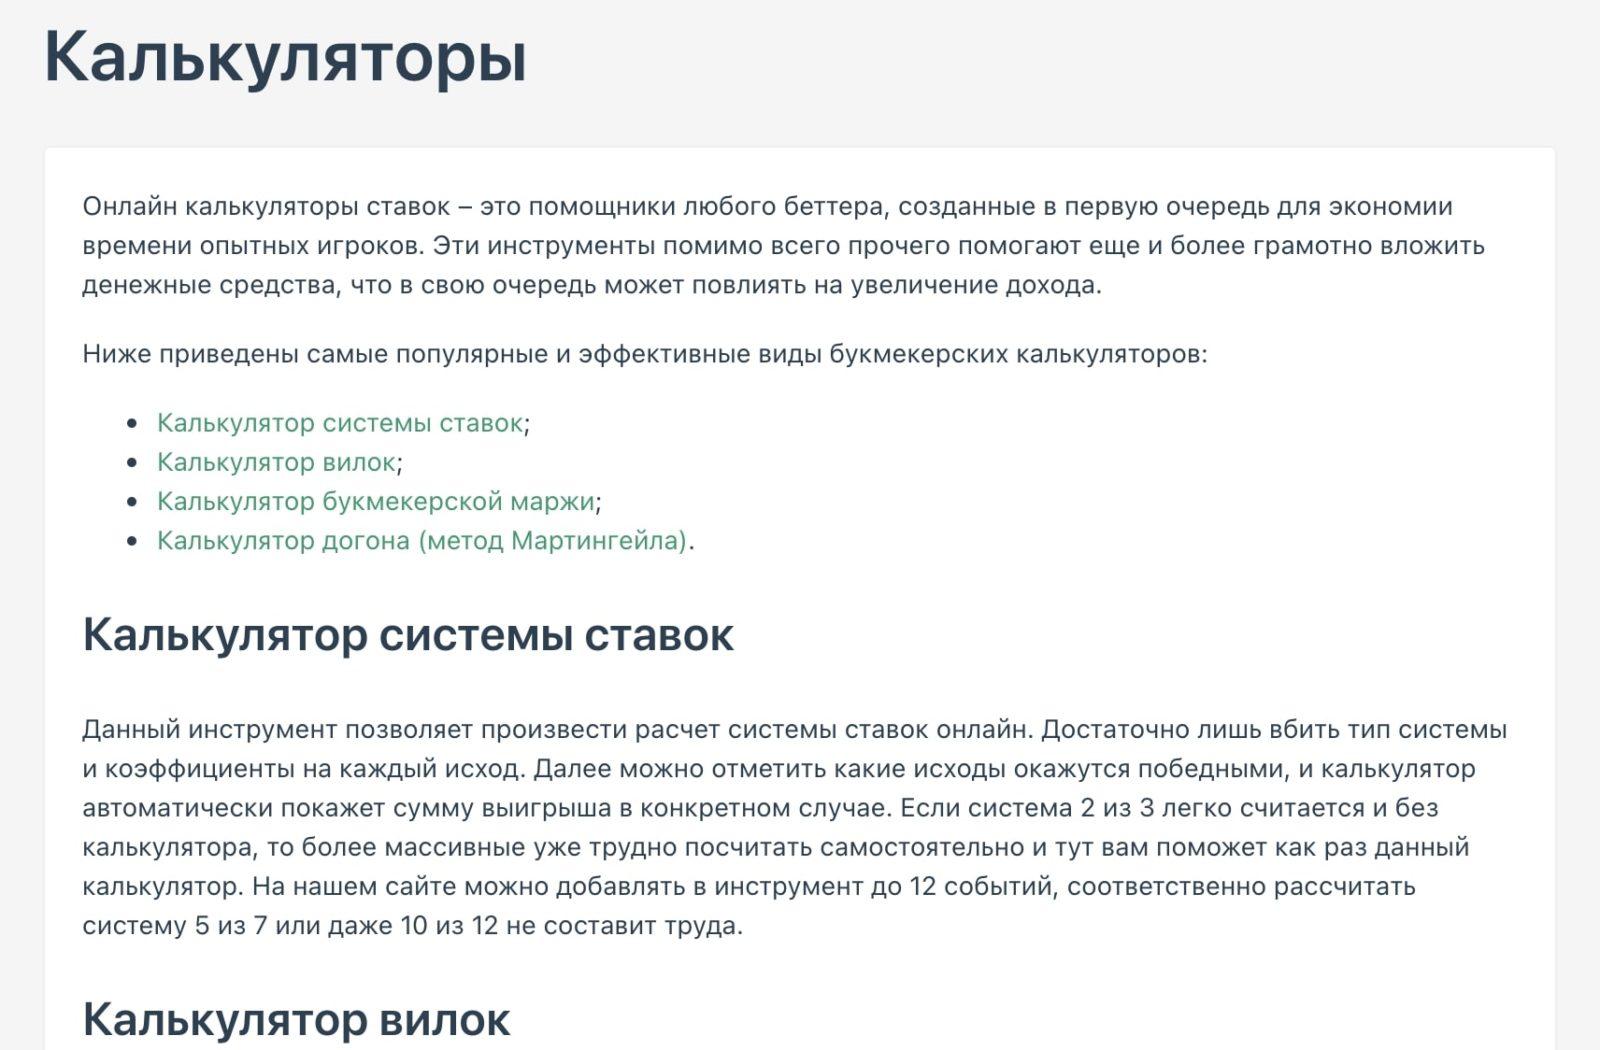 Калькулятор на сайте Stavkiprognozy.ru (Ставки прогнозы ру)